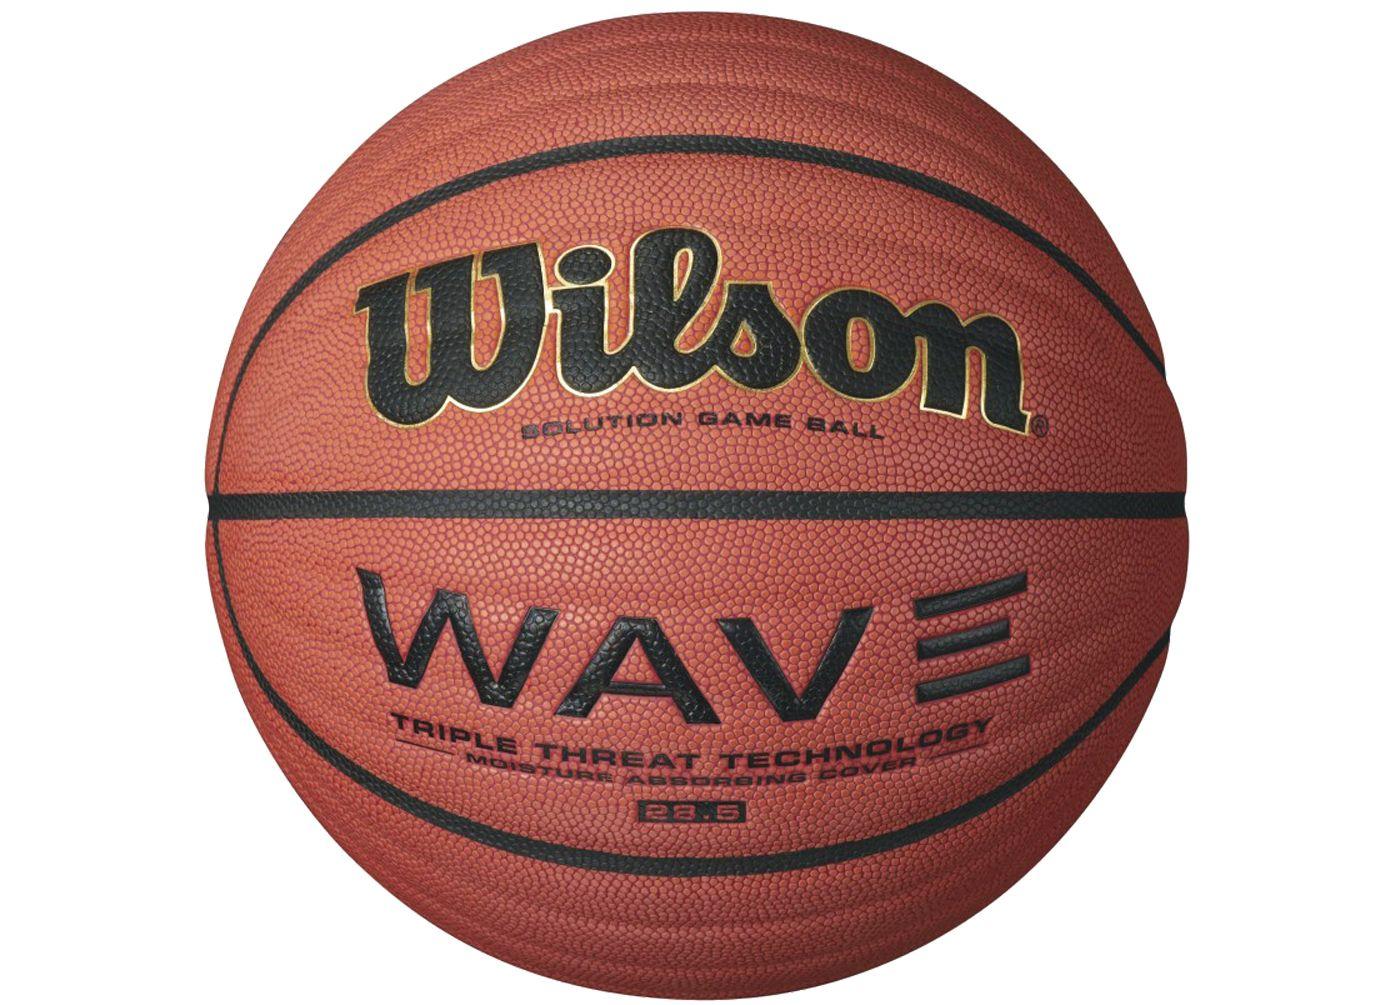 "Wilson Wave Solution Game Basketball (28.5"")"